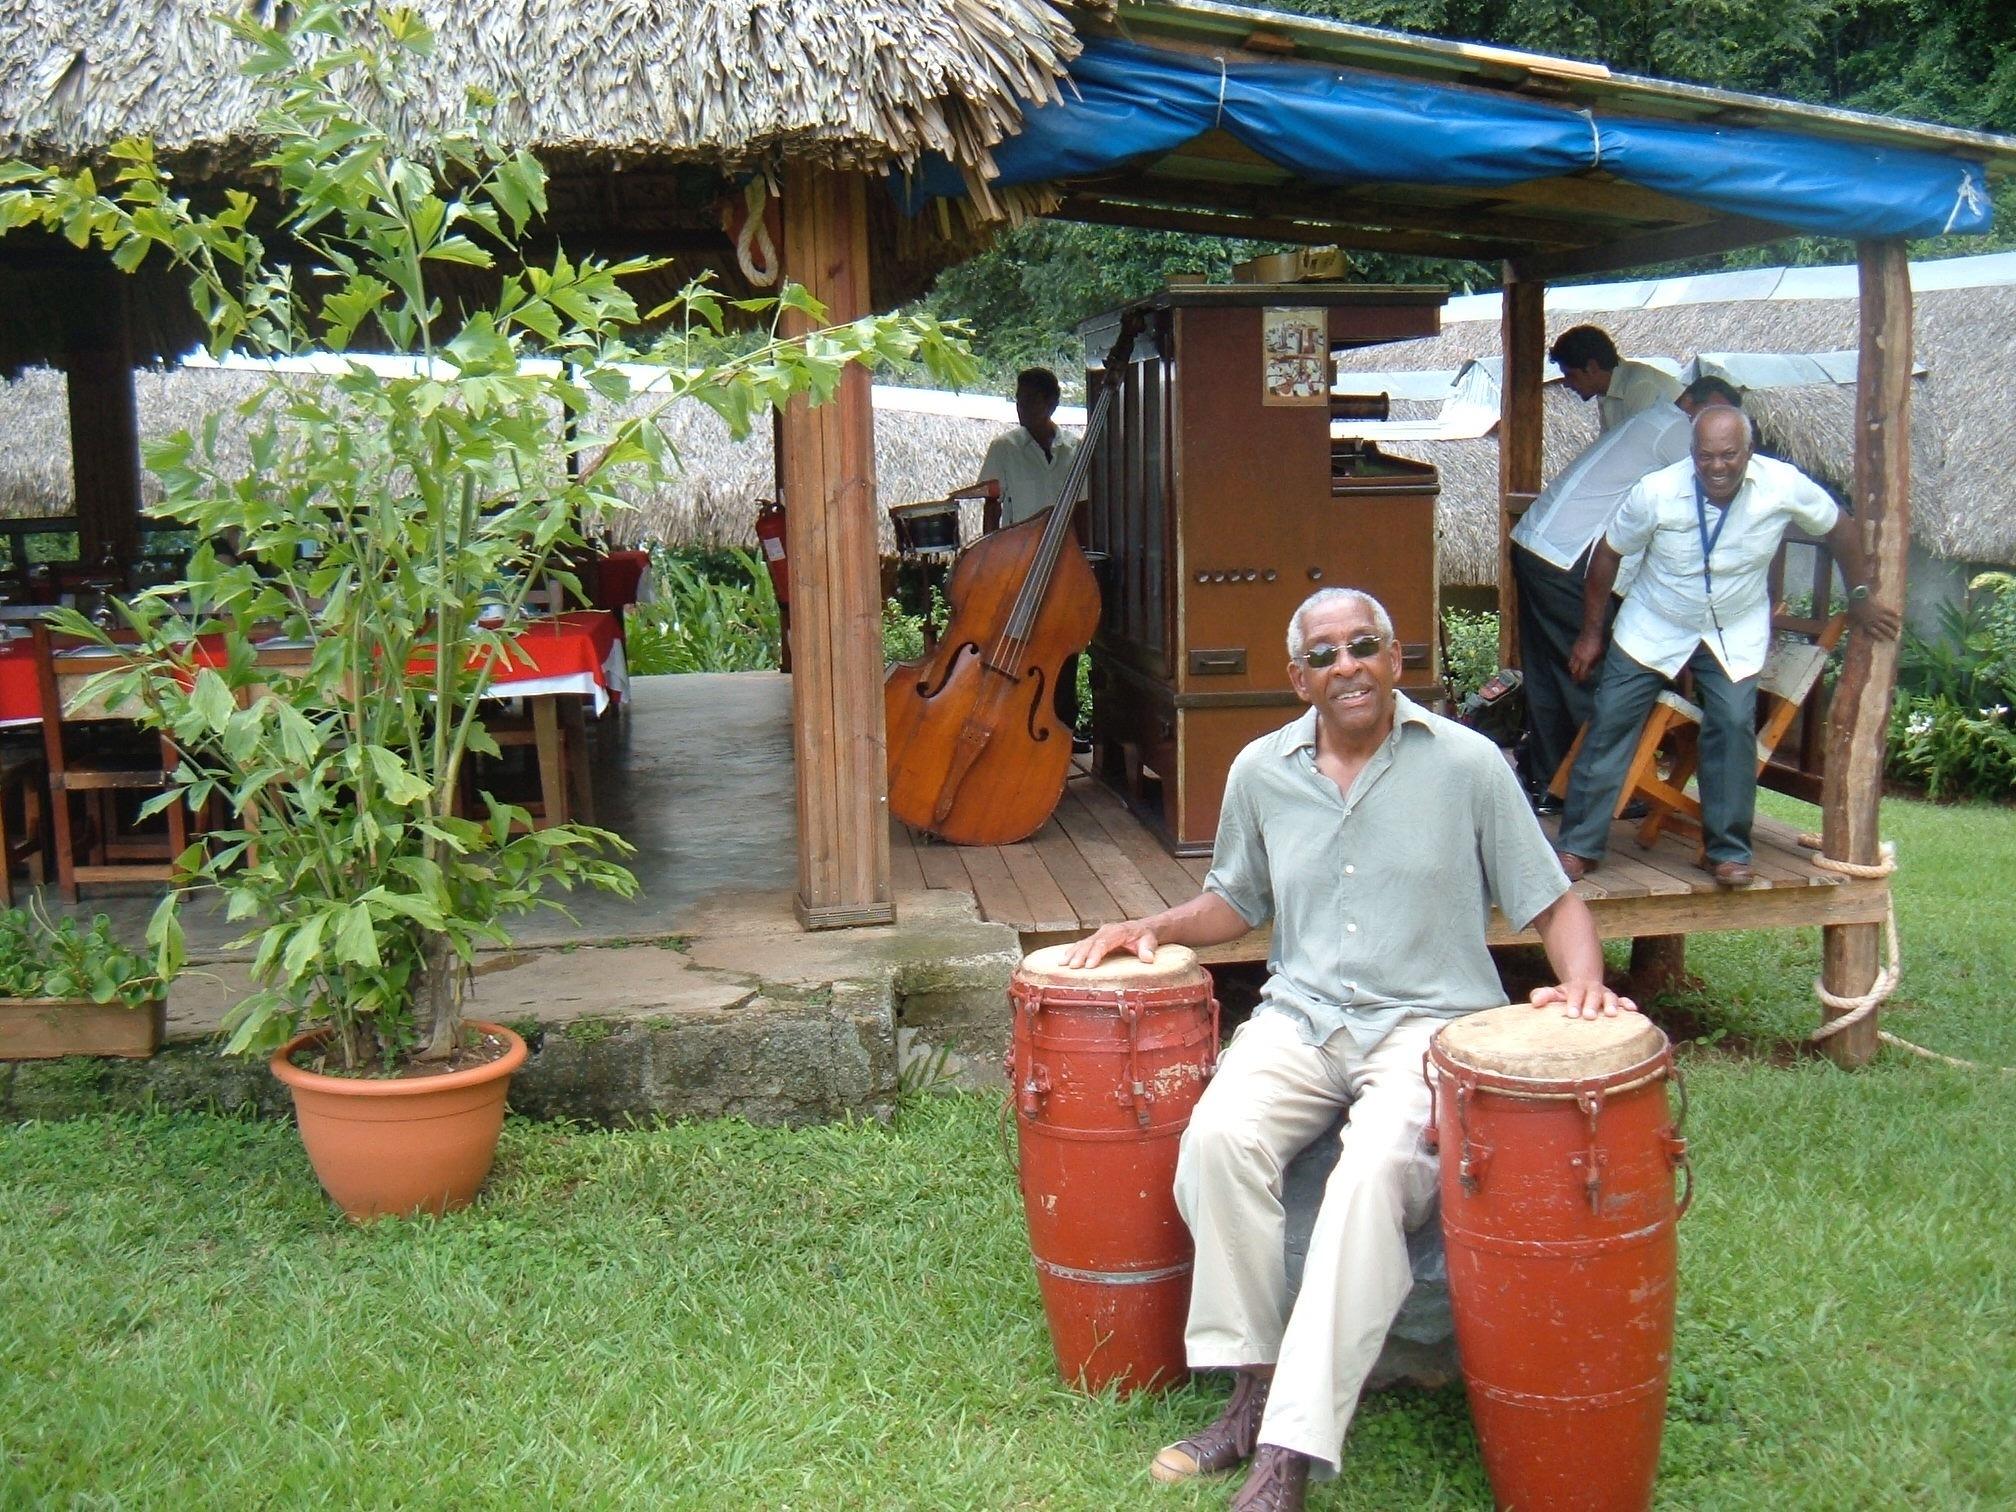 Cuban Congas